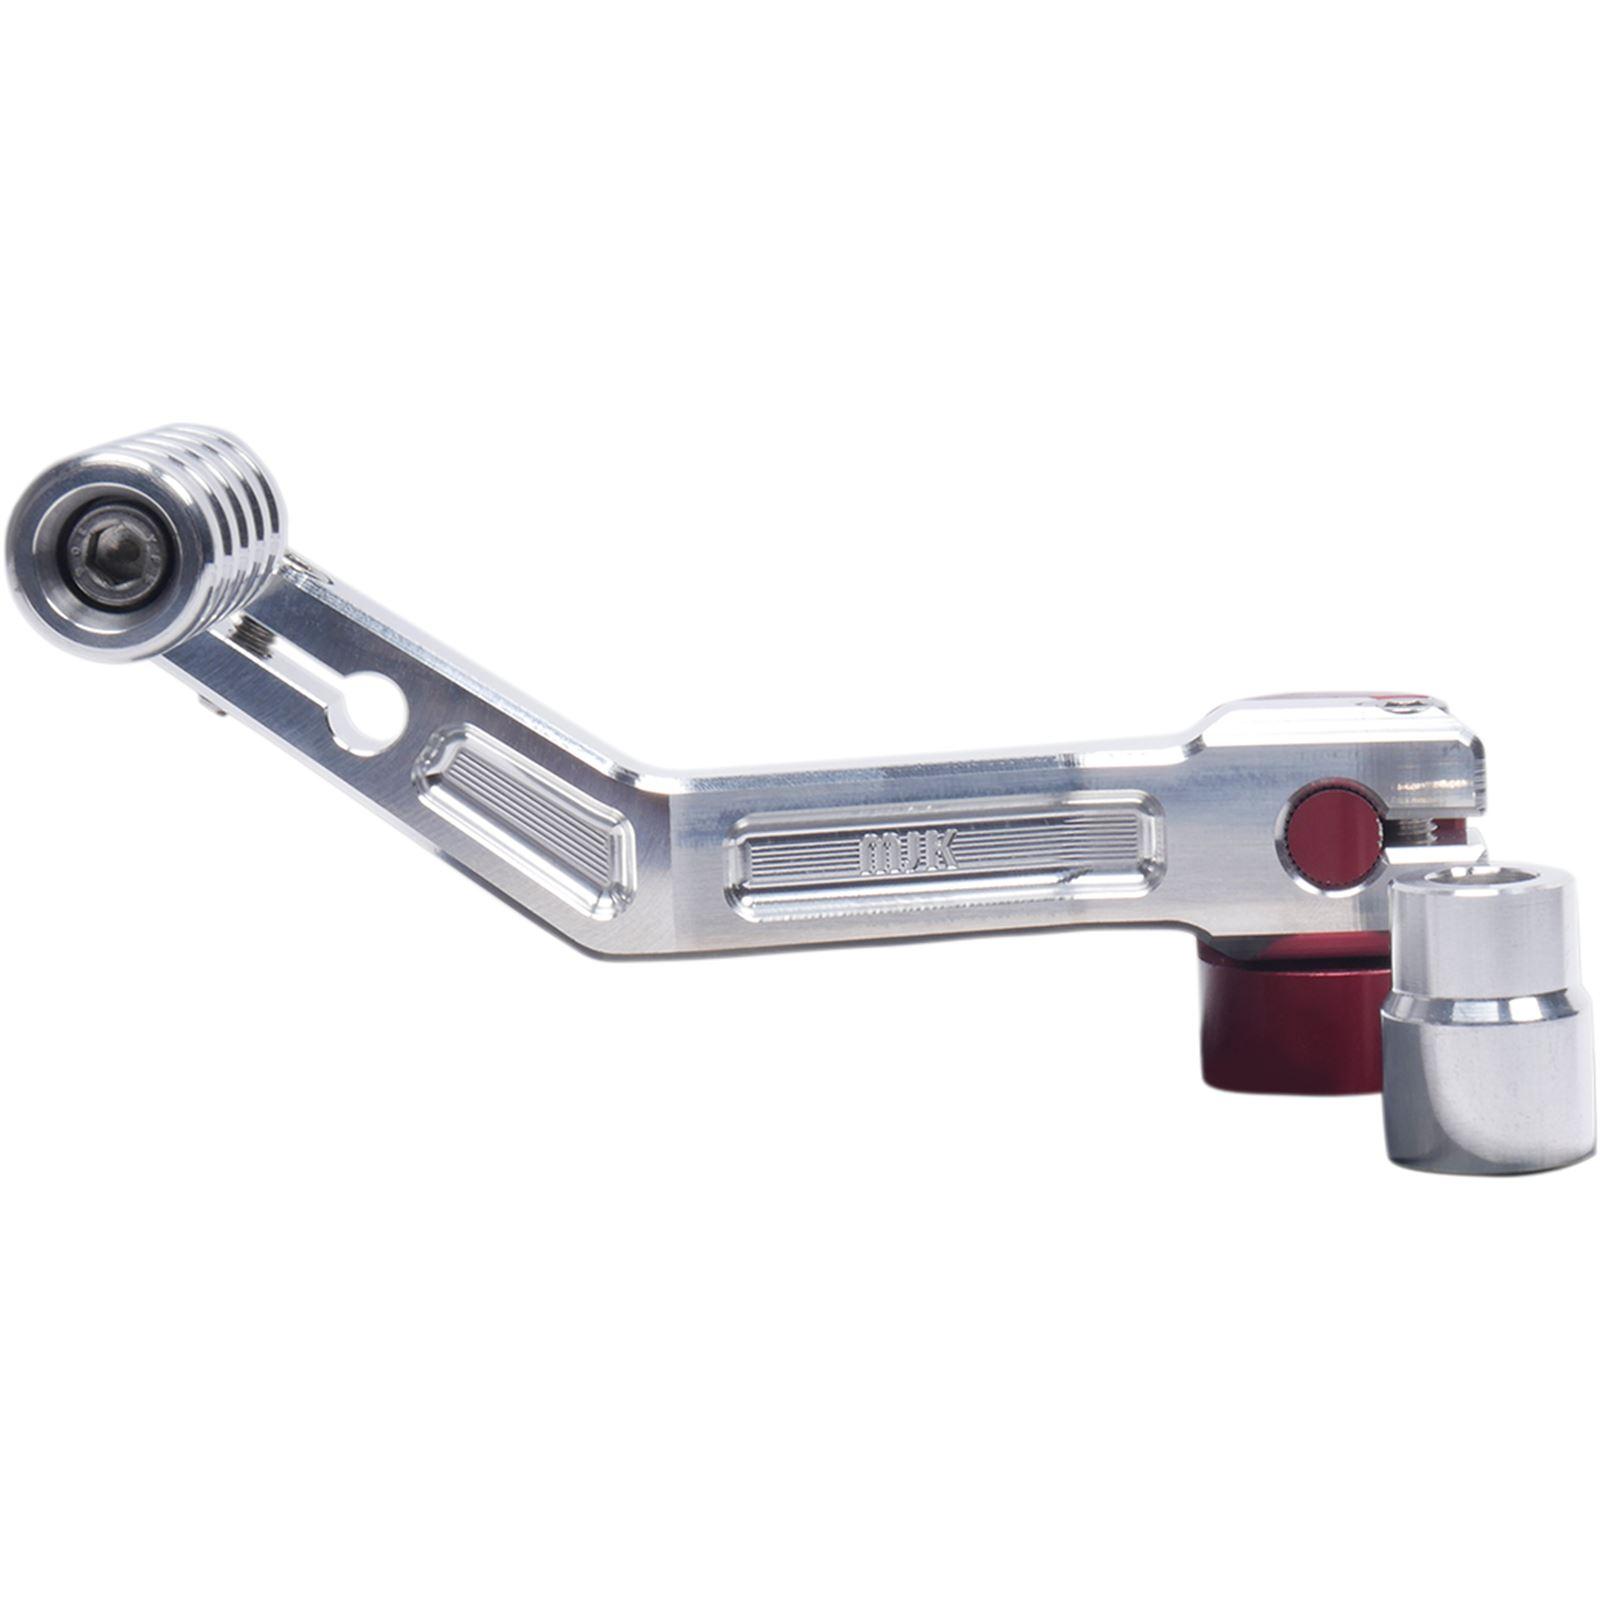 MJK Performance Adjustable Shifter with Peg